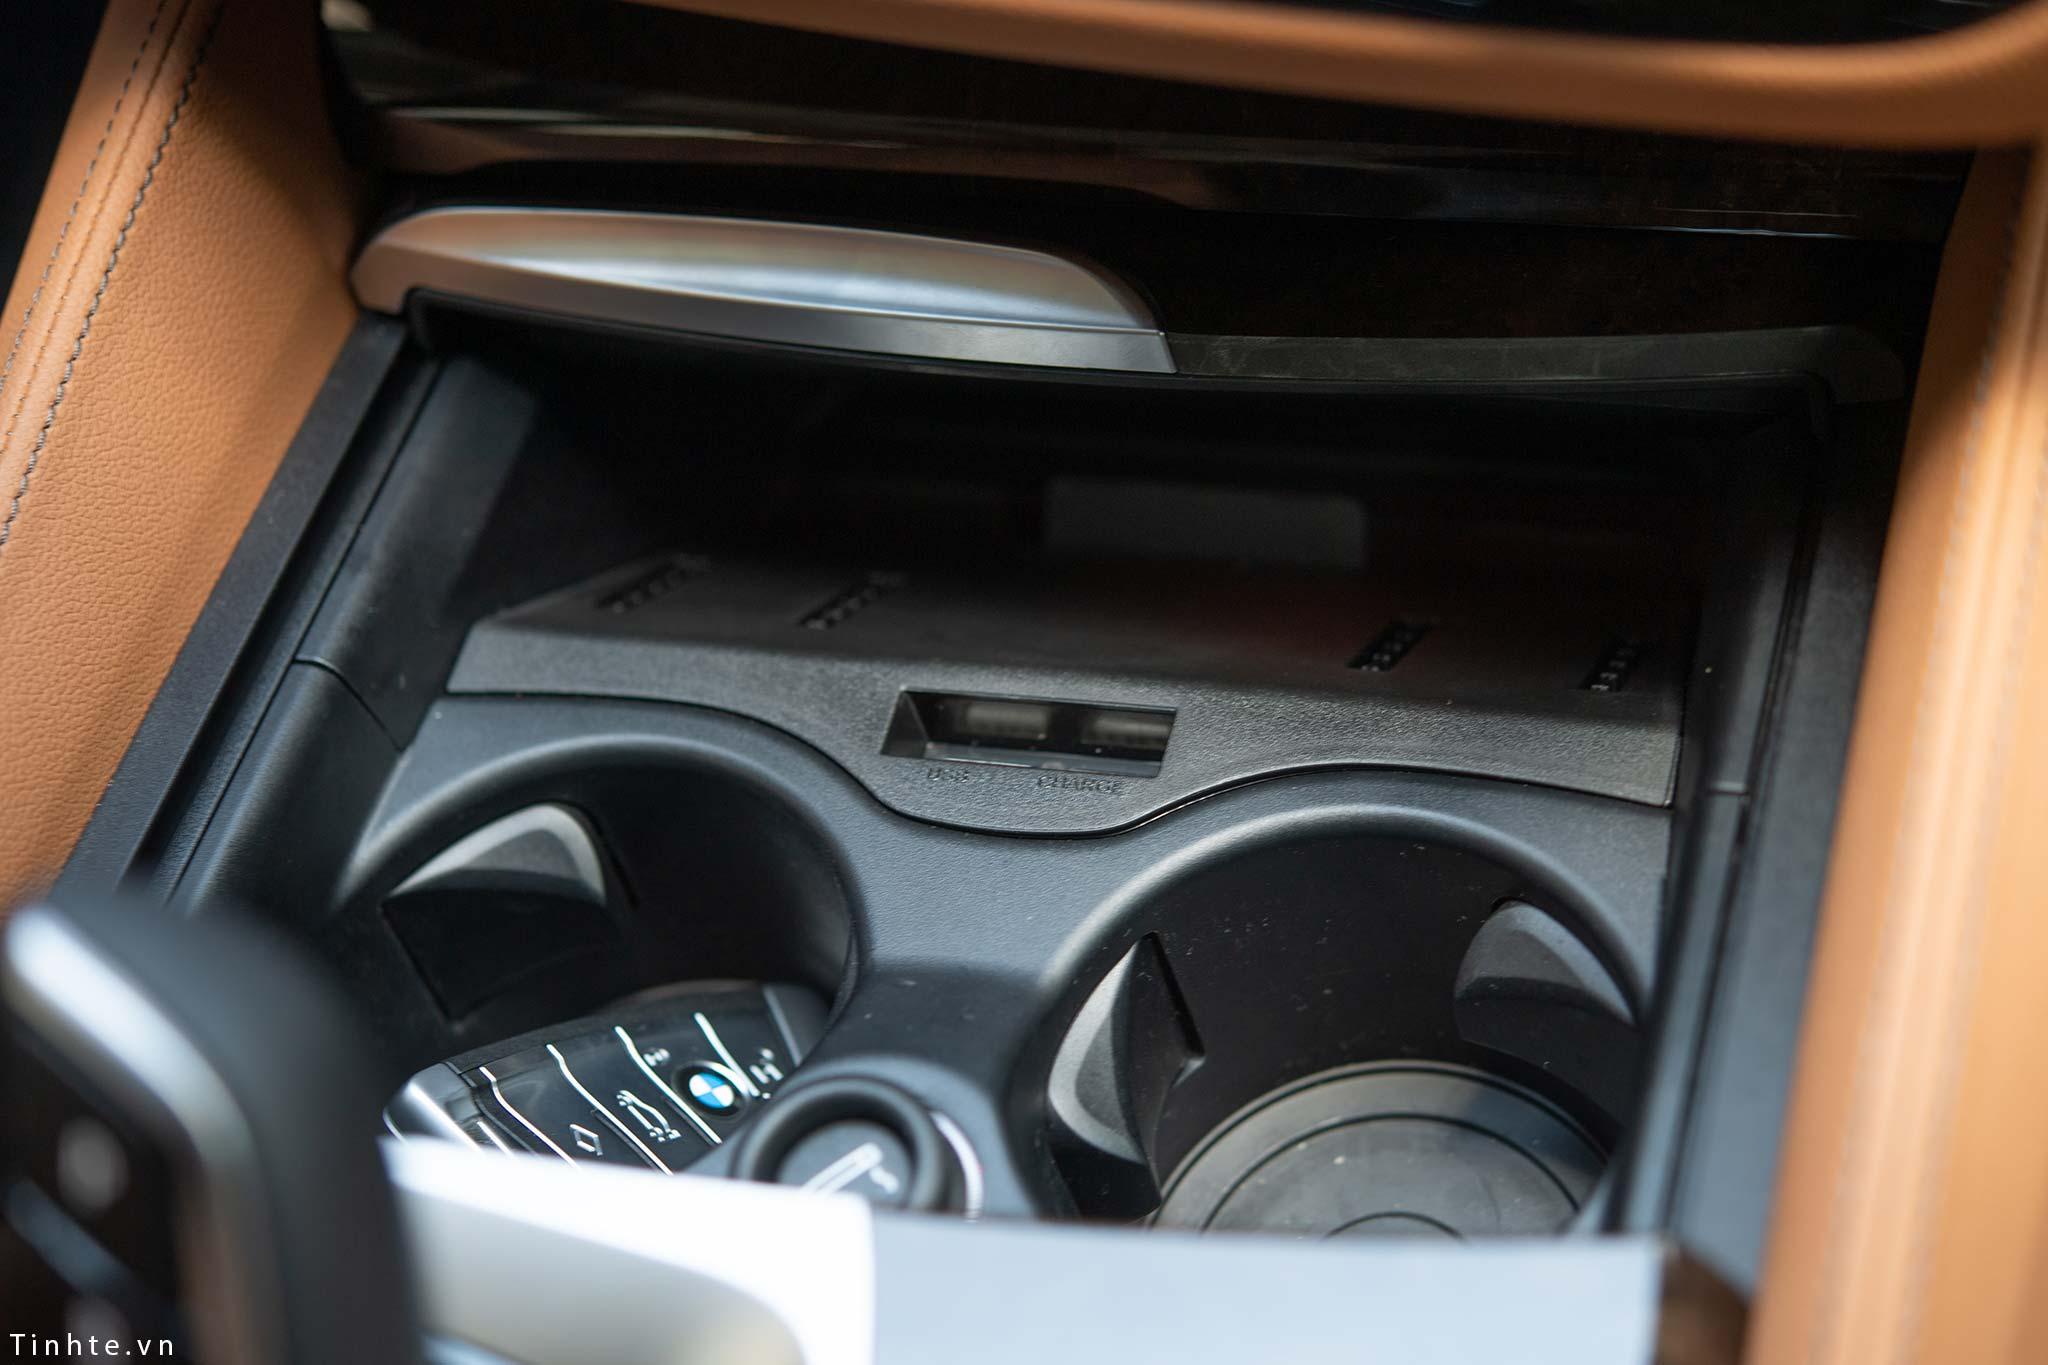 BMW_530i_G30_tinhte_28.jpg